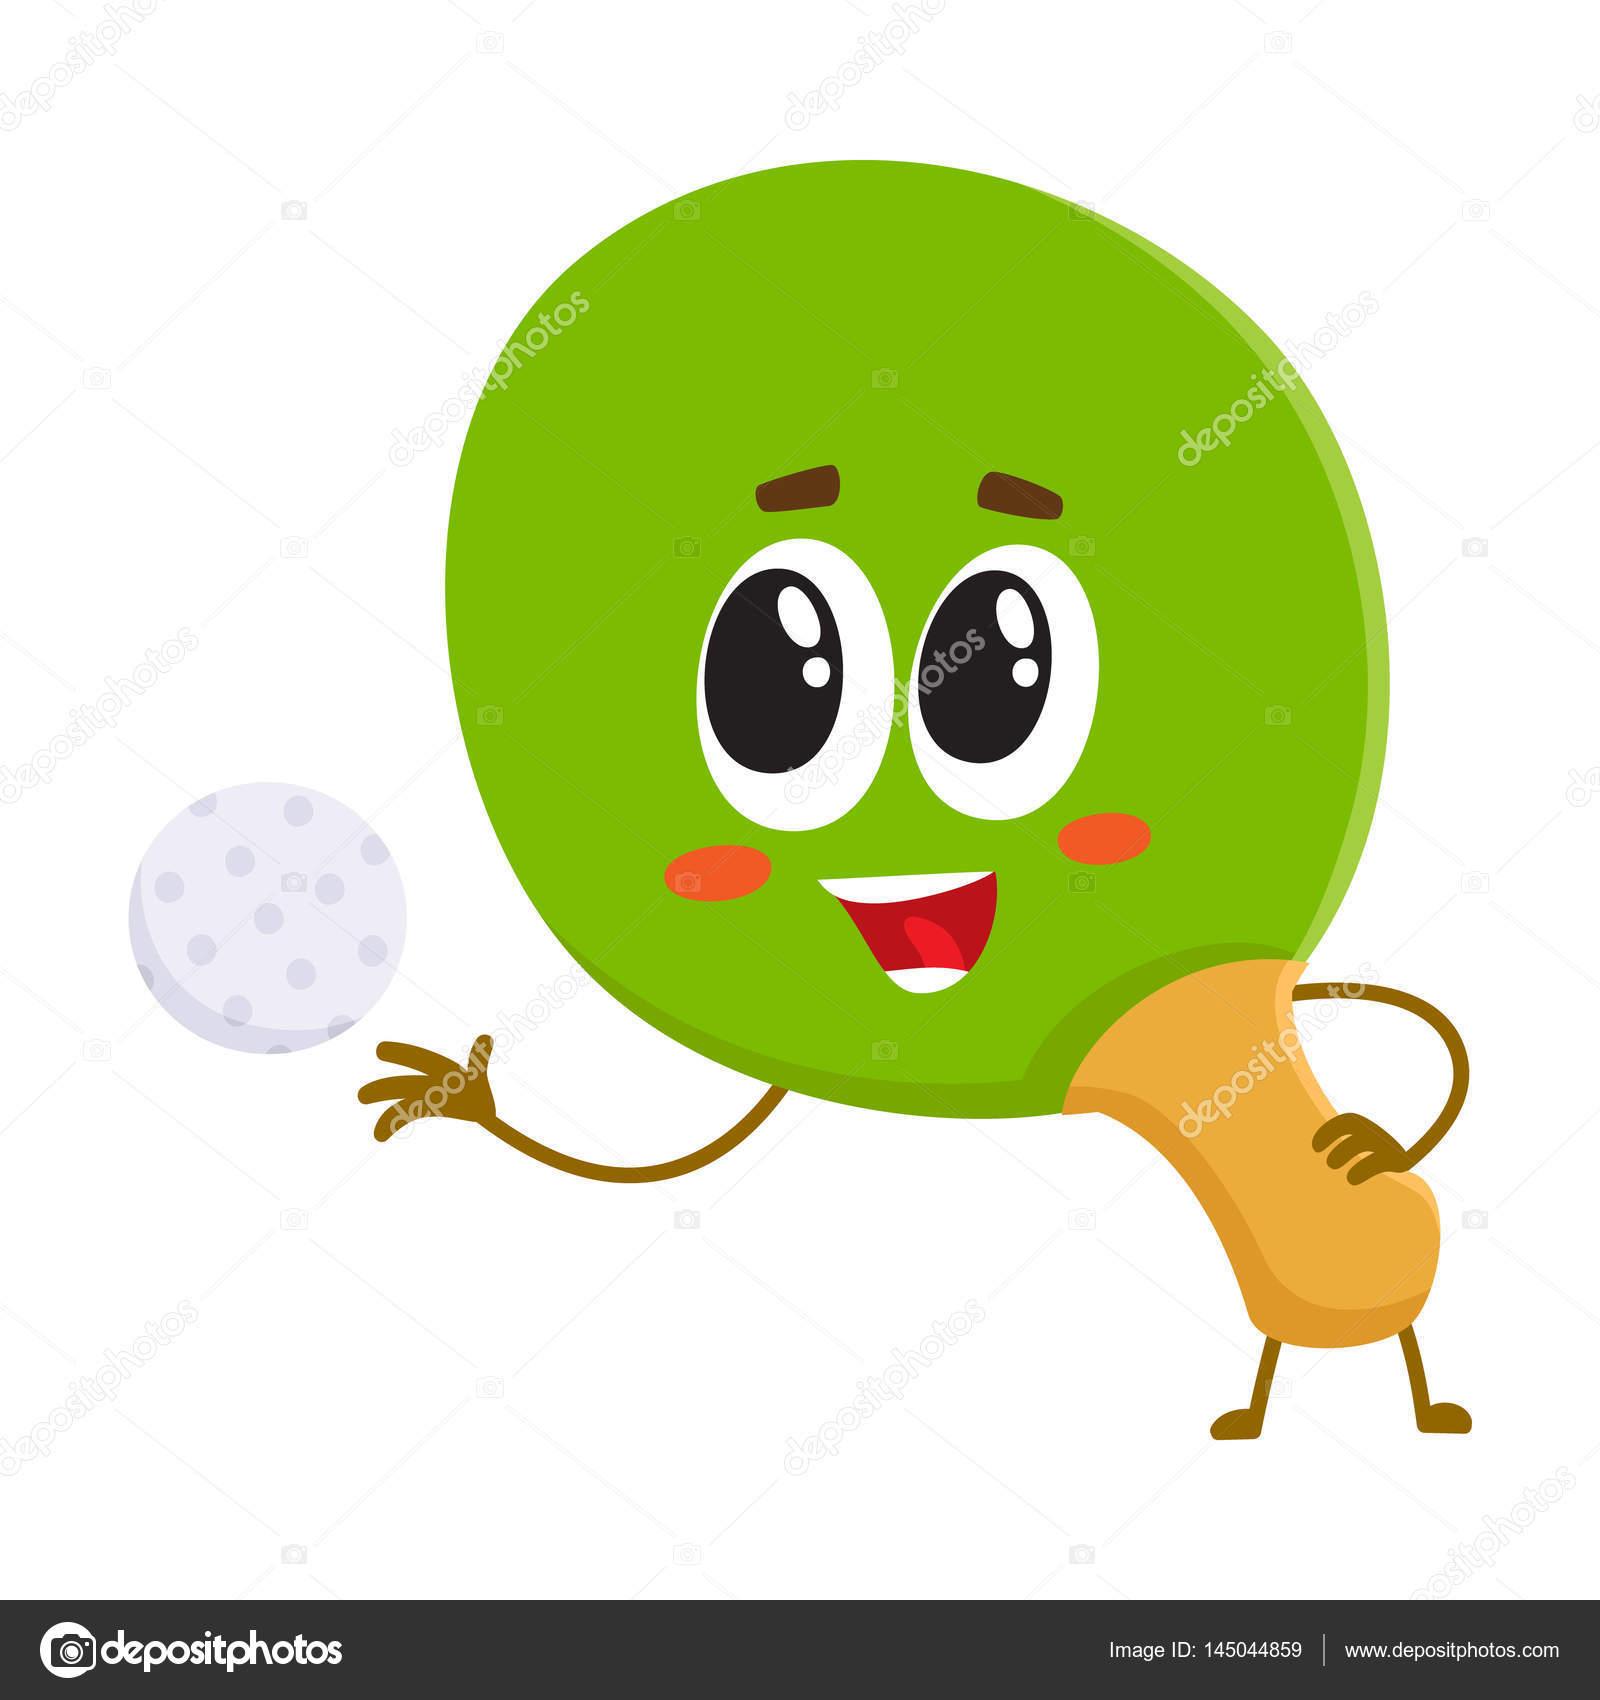 Z bavn stoln tenis ping pong raketa charakter s lidskou - Tennis de table poitou charente ...